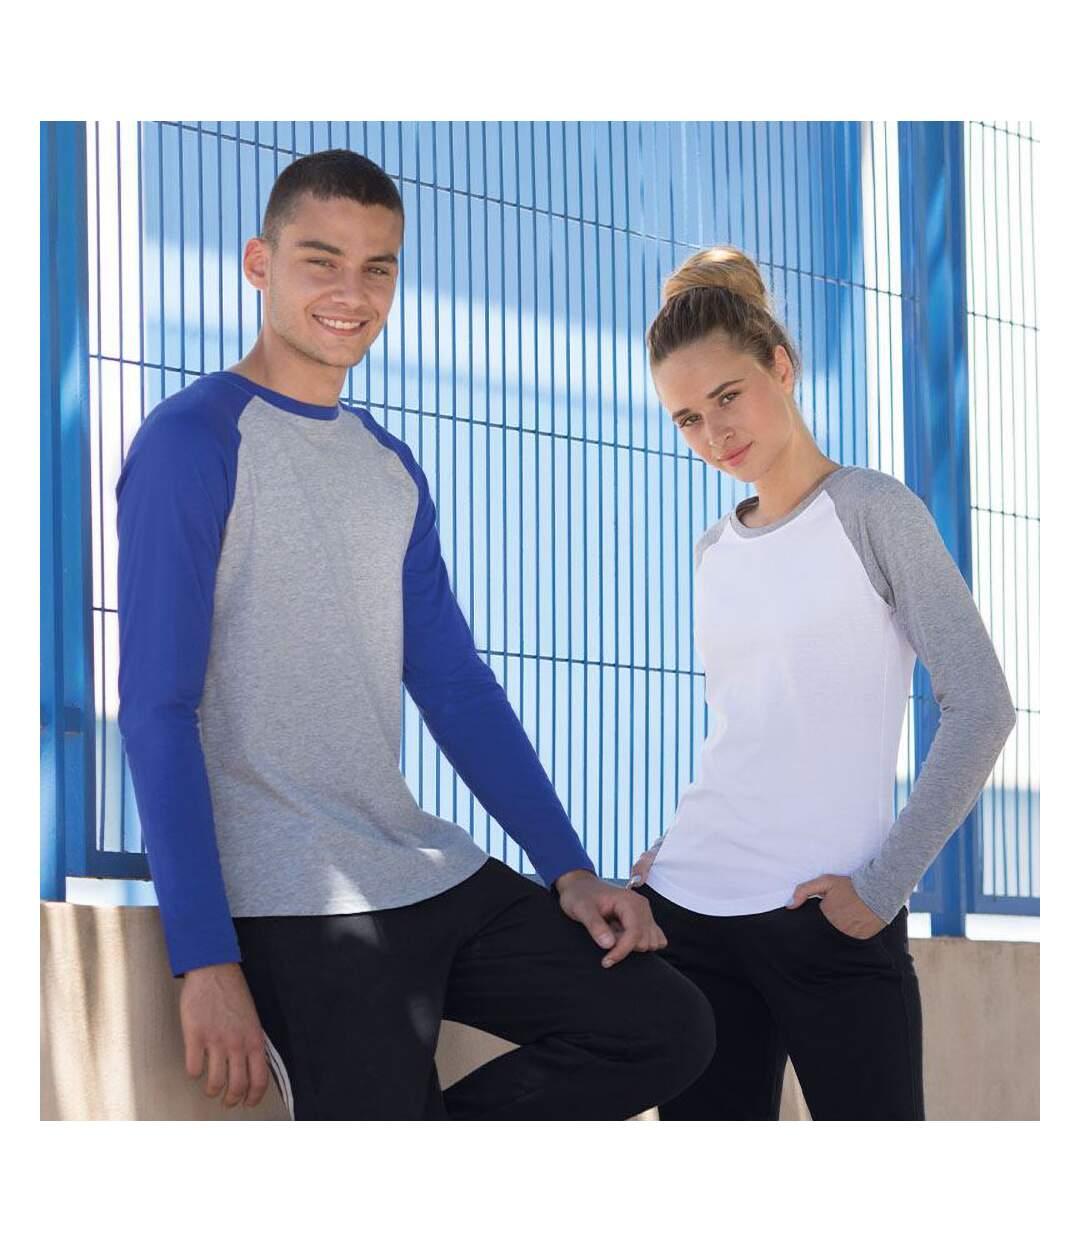 Skinnifit Mens Raglan Long Sleeve Baseball T-Shirt (Heather Grey / Black) - UTRW4742